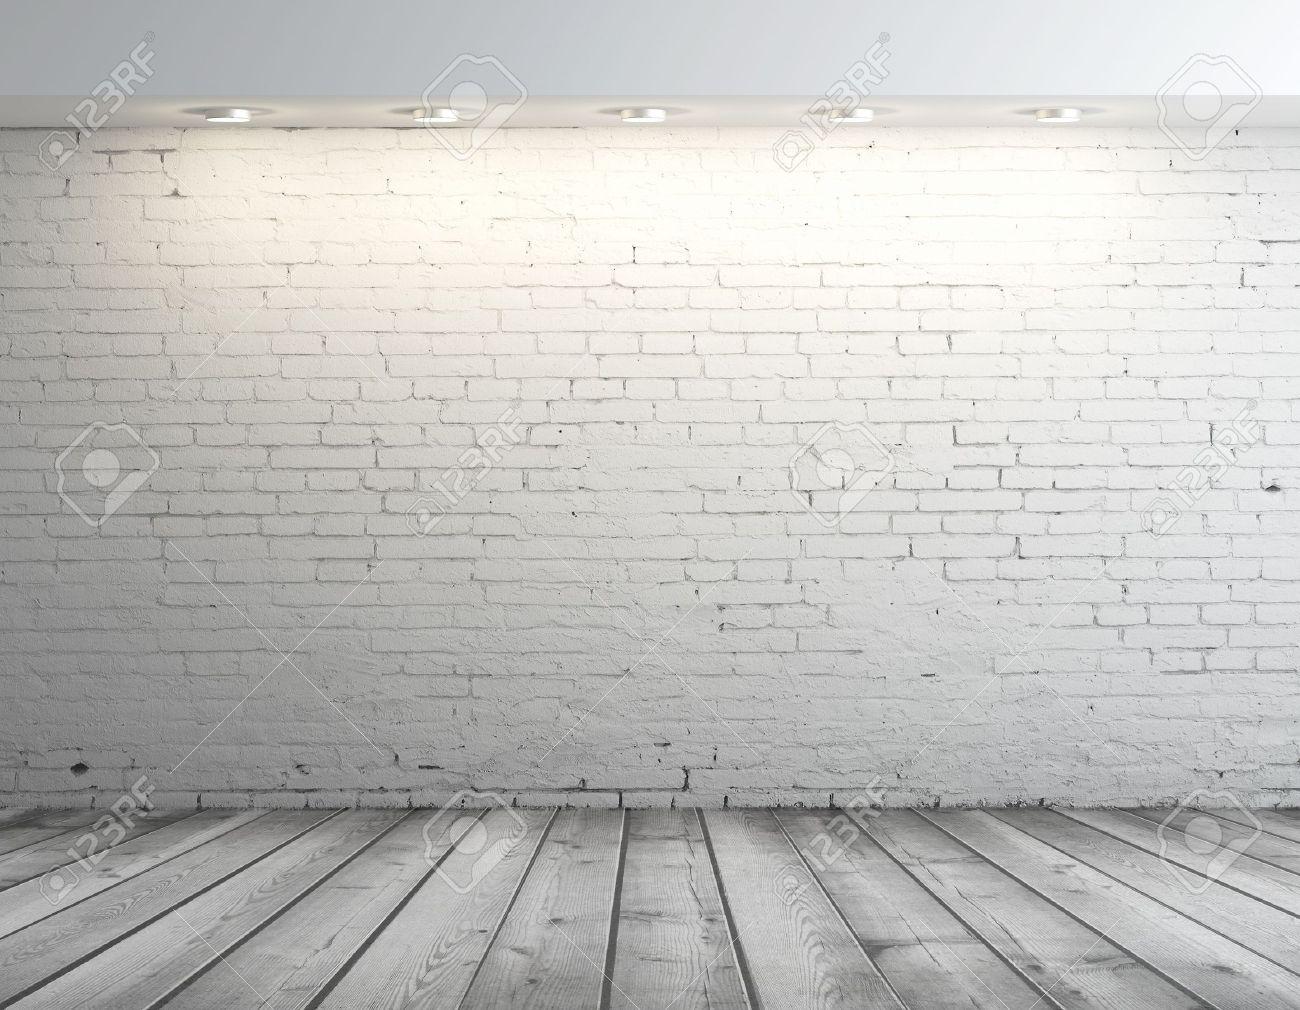 high resolution brick wall and gray floor - 17414821